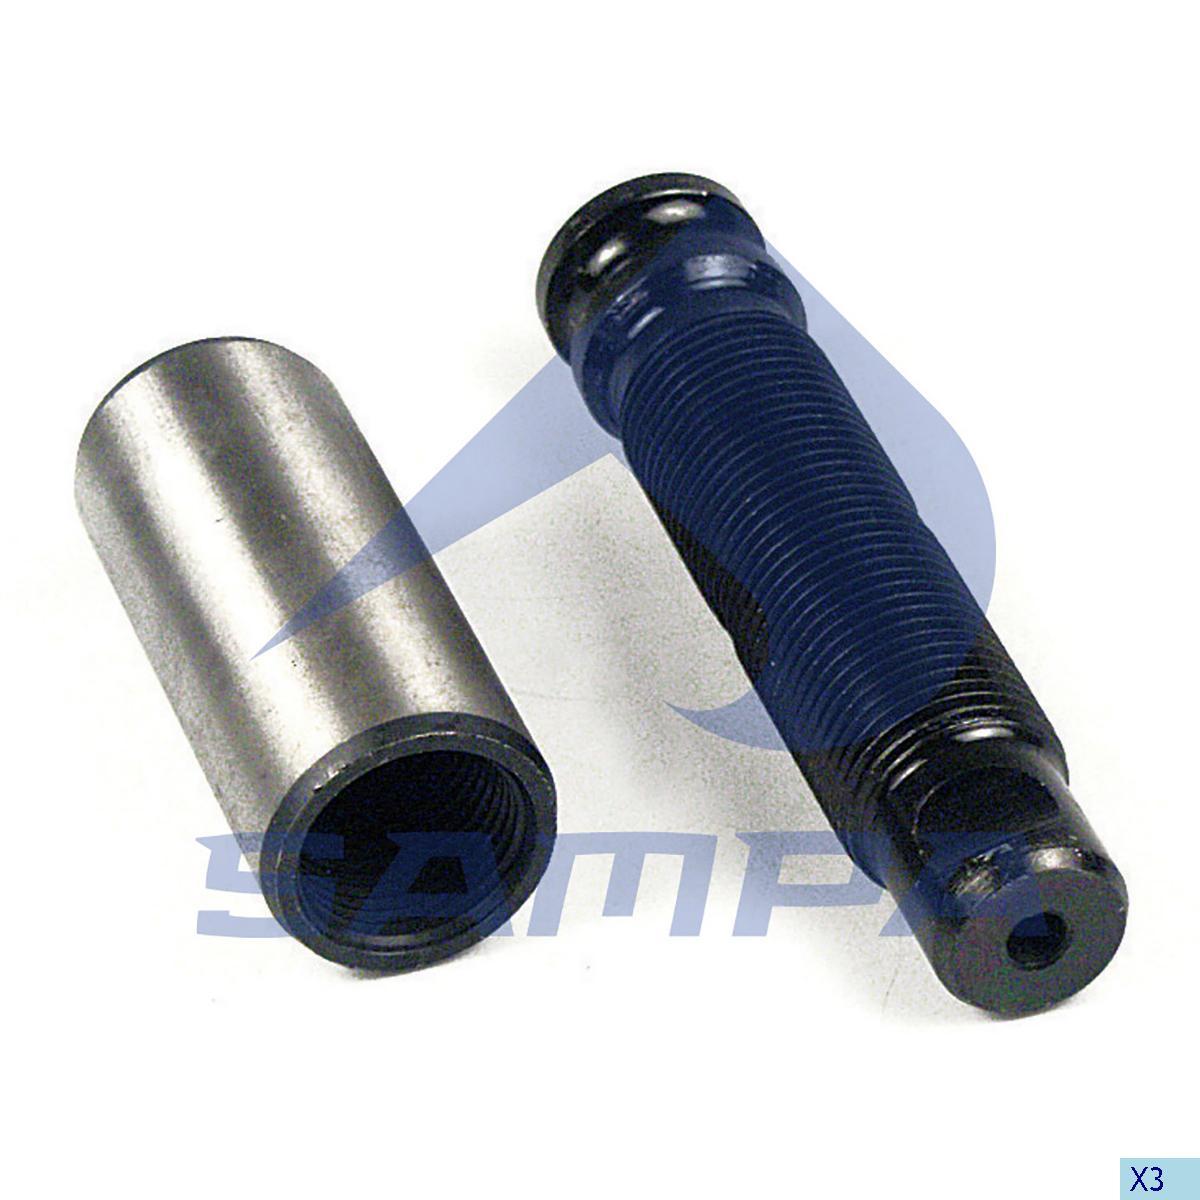 Repair Kit, Spring, Volvo, Suspension